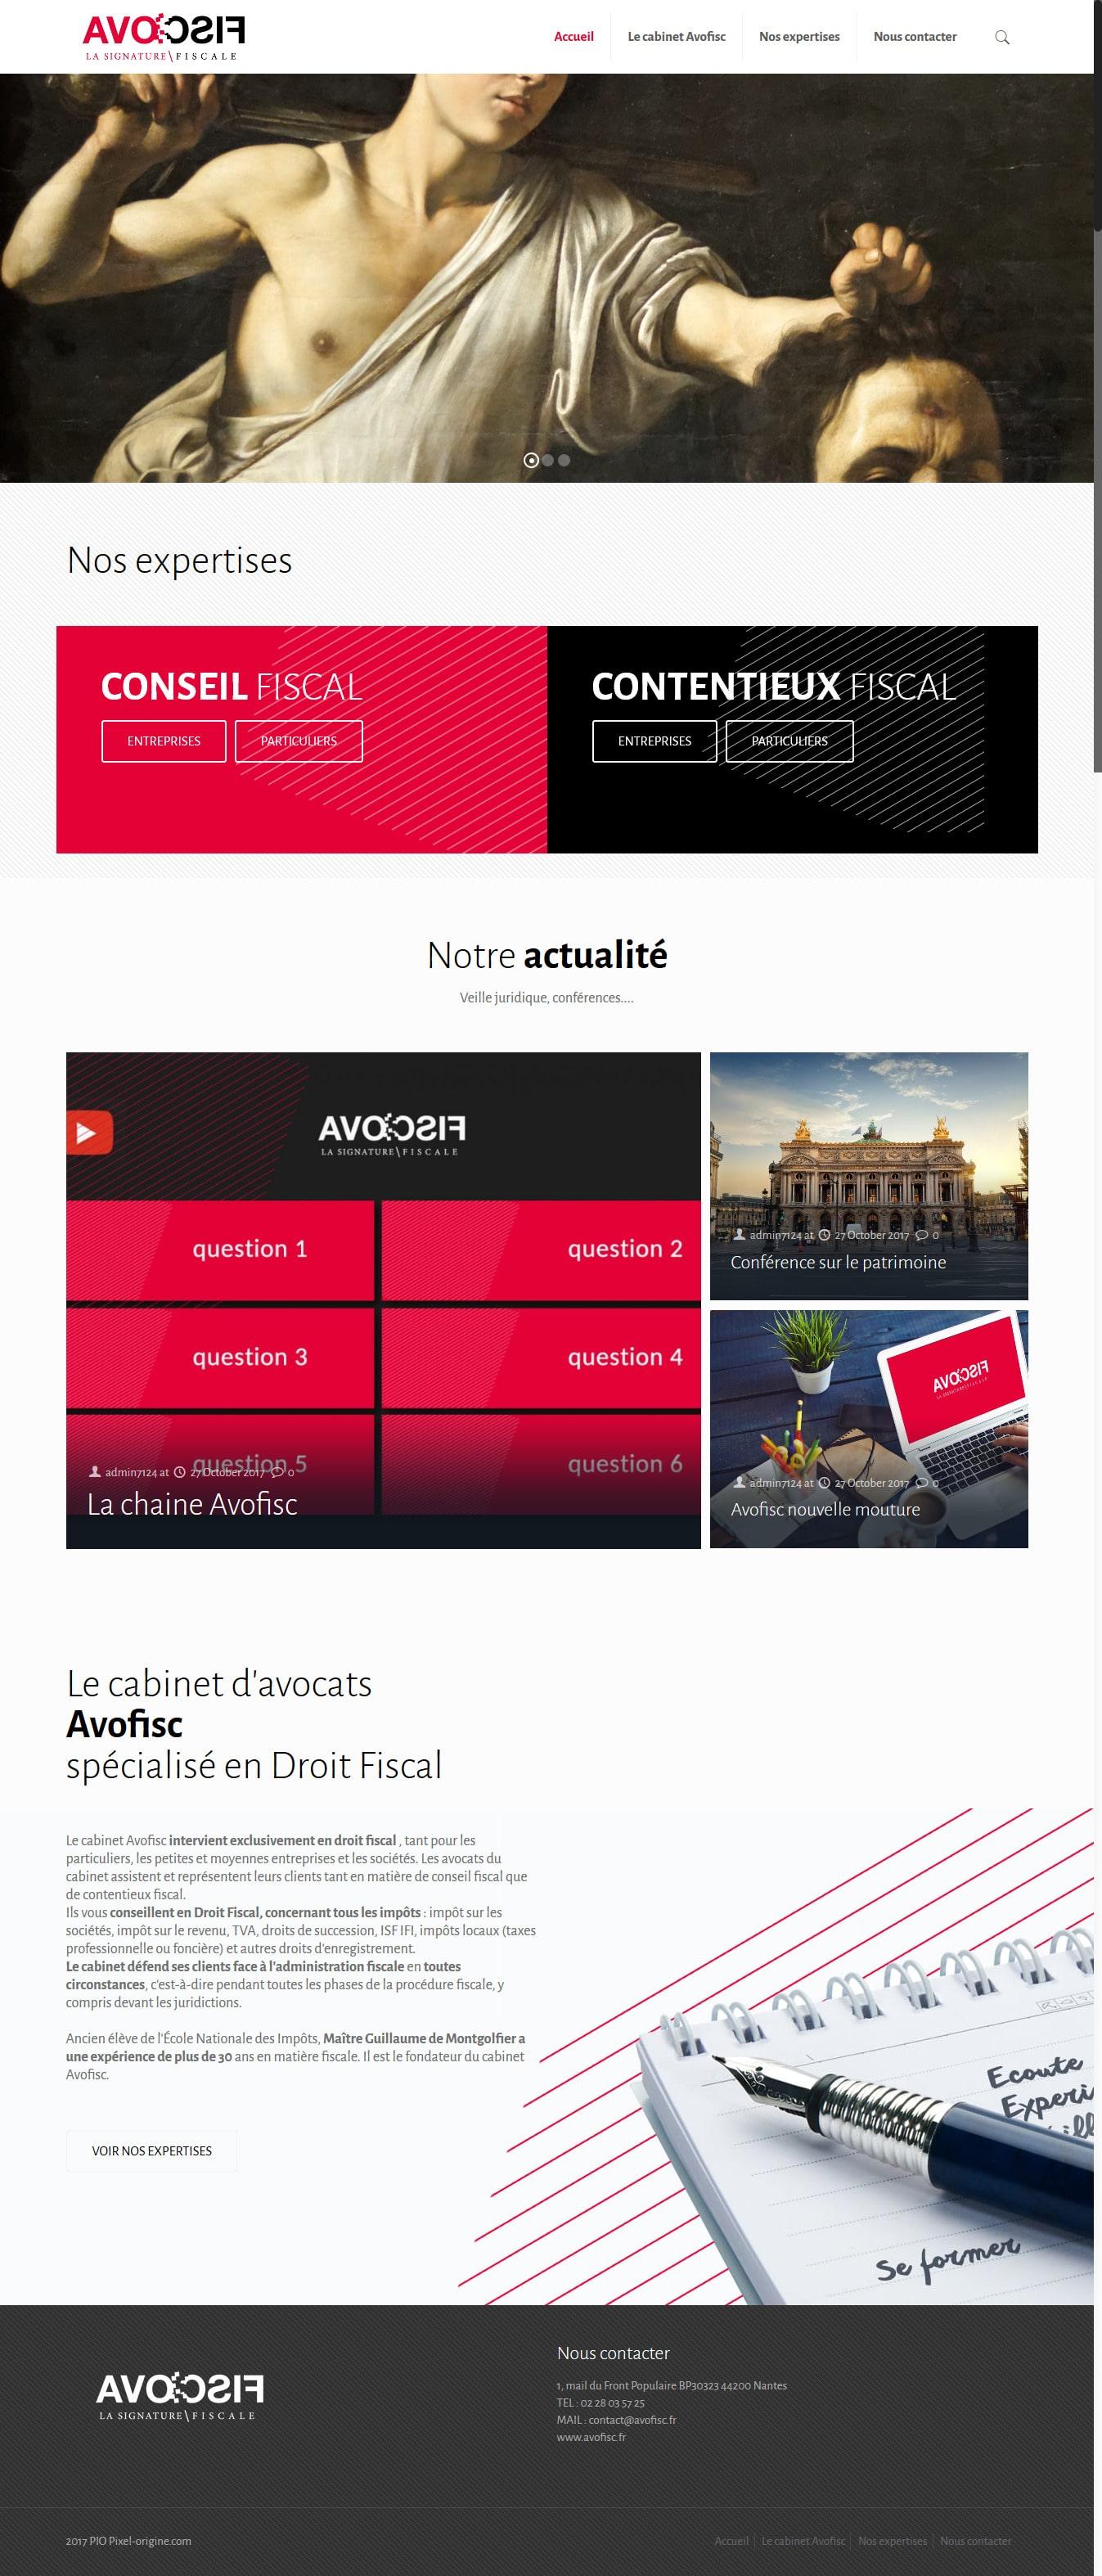 Avofisc – avocats fiscalistes Nantes